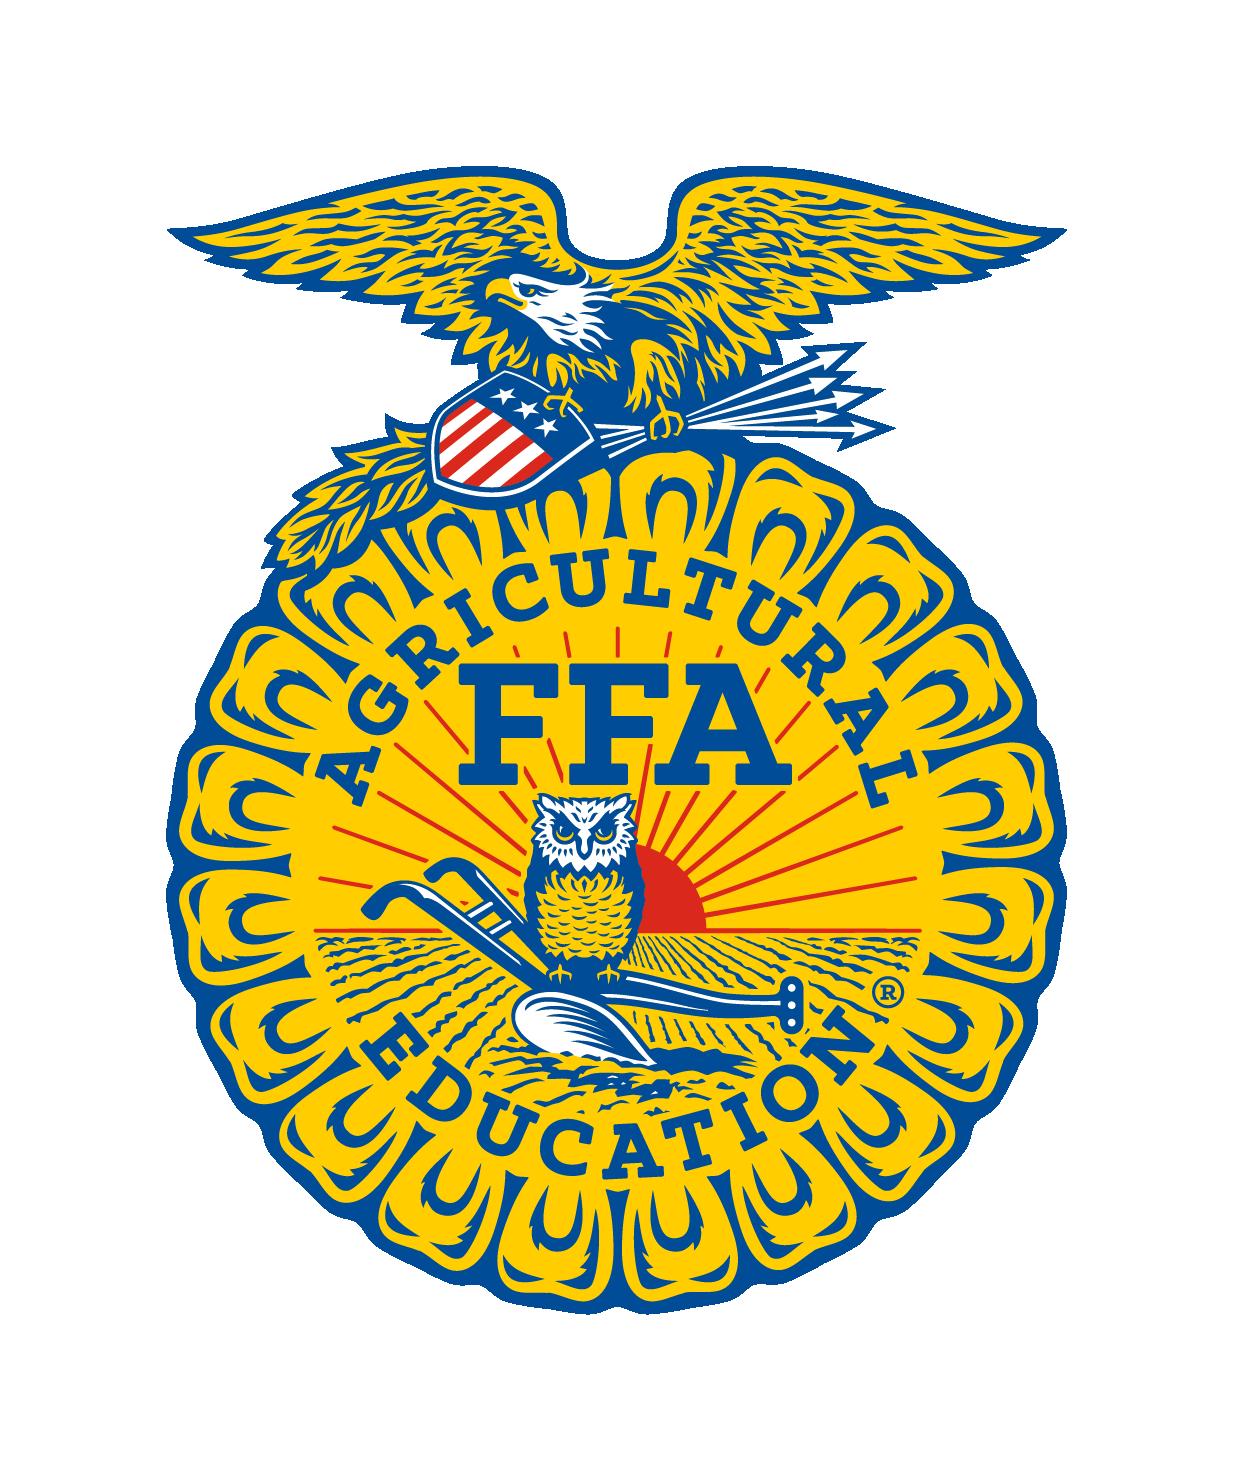 Washington Ffaociation